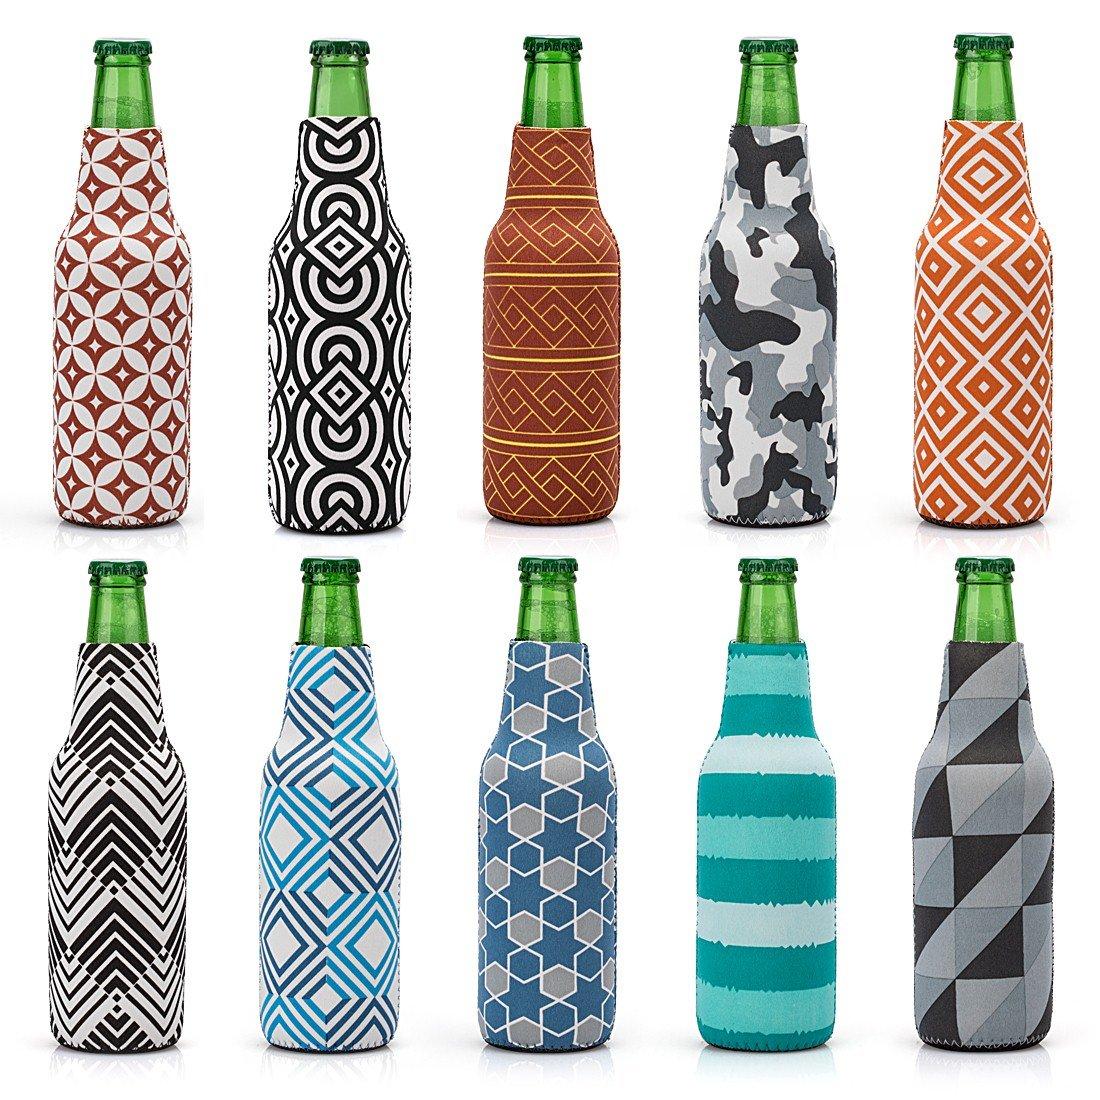 Avery Barn 10pc Mixed Trendy Design Neoprene Zipper Sleeve Insulated Beer Bottle Covers - Set 3: Patternpalooza